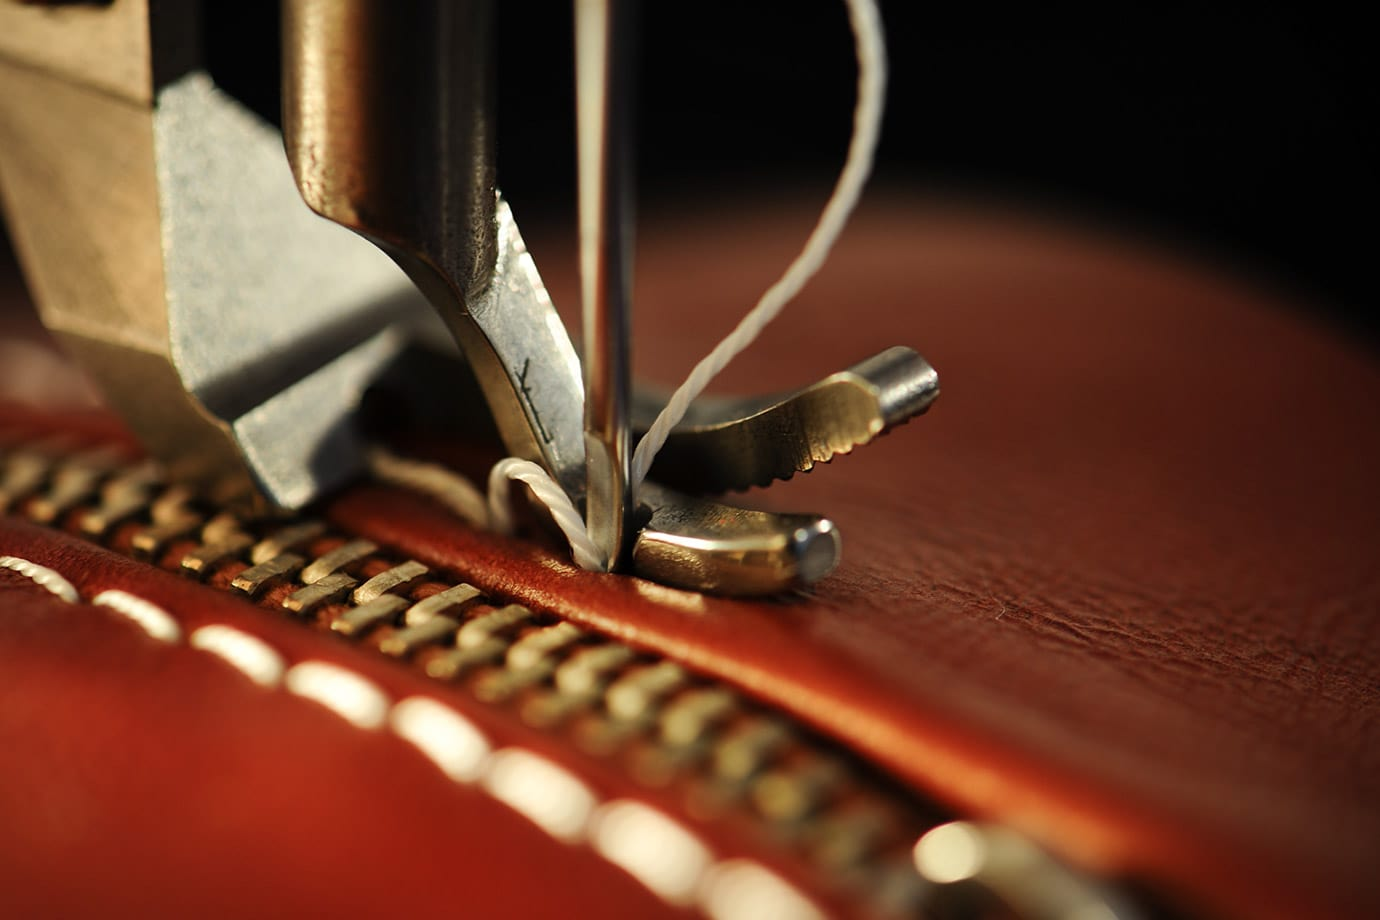 leather restoration repair london on